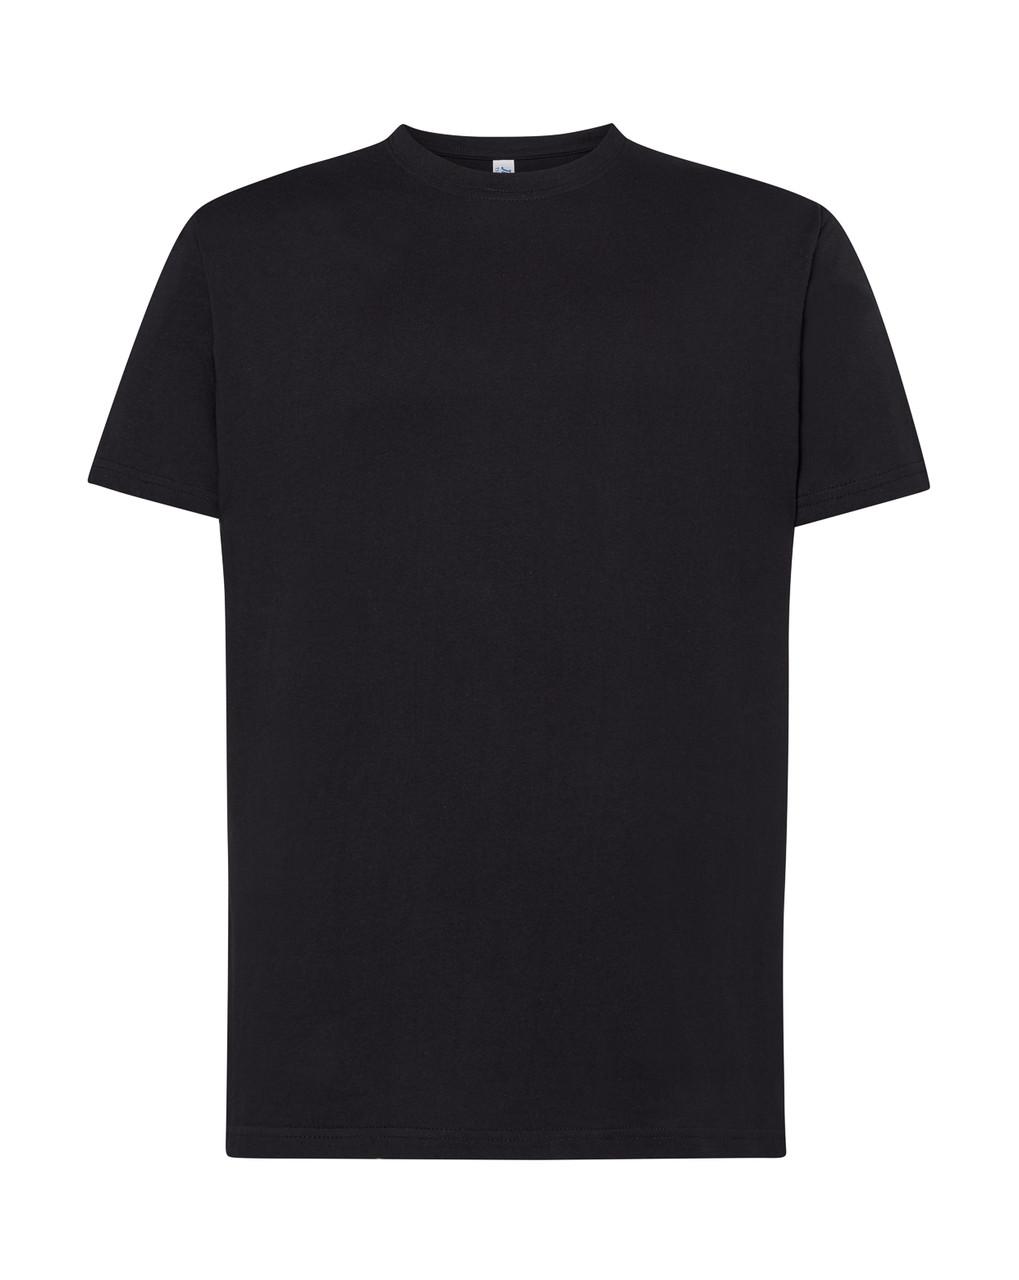 Мужская футболка JHK REGULAR PREMIUM T-SHIRT цвет черный (BK)